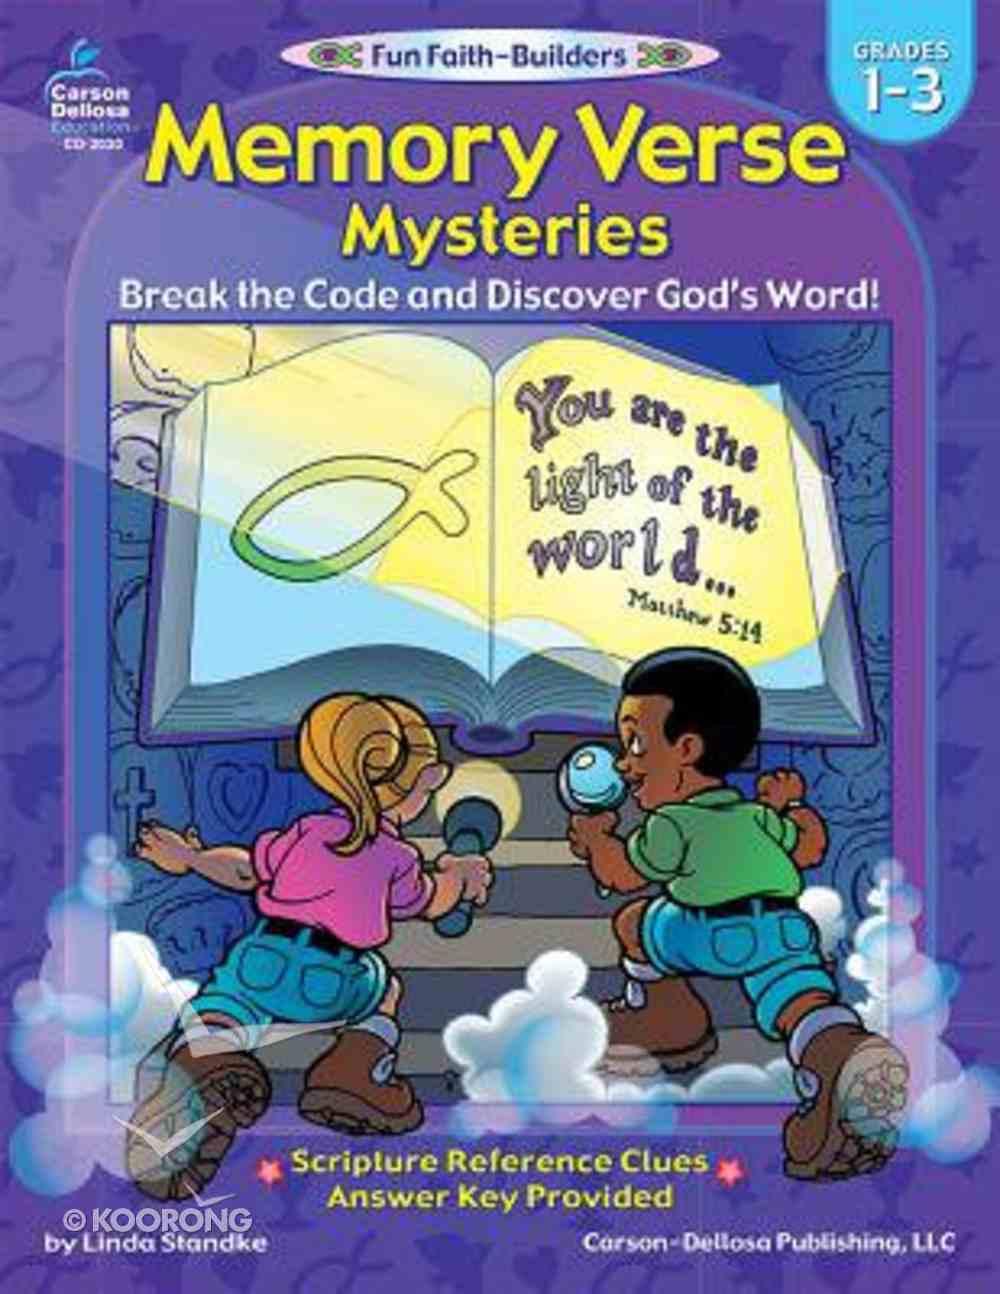 Memory Verse Mysteries (Reproducible; Grades 1-3) (Fun Faith-builders Series) Paperback